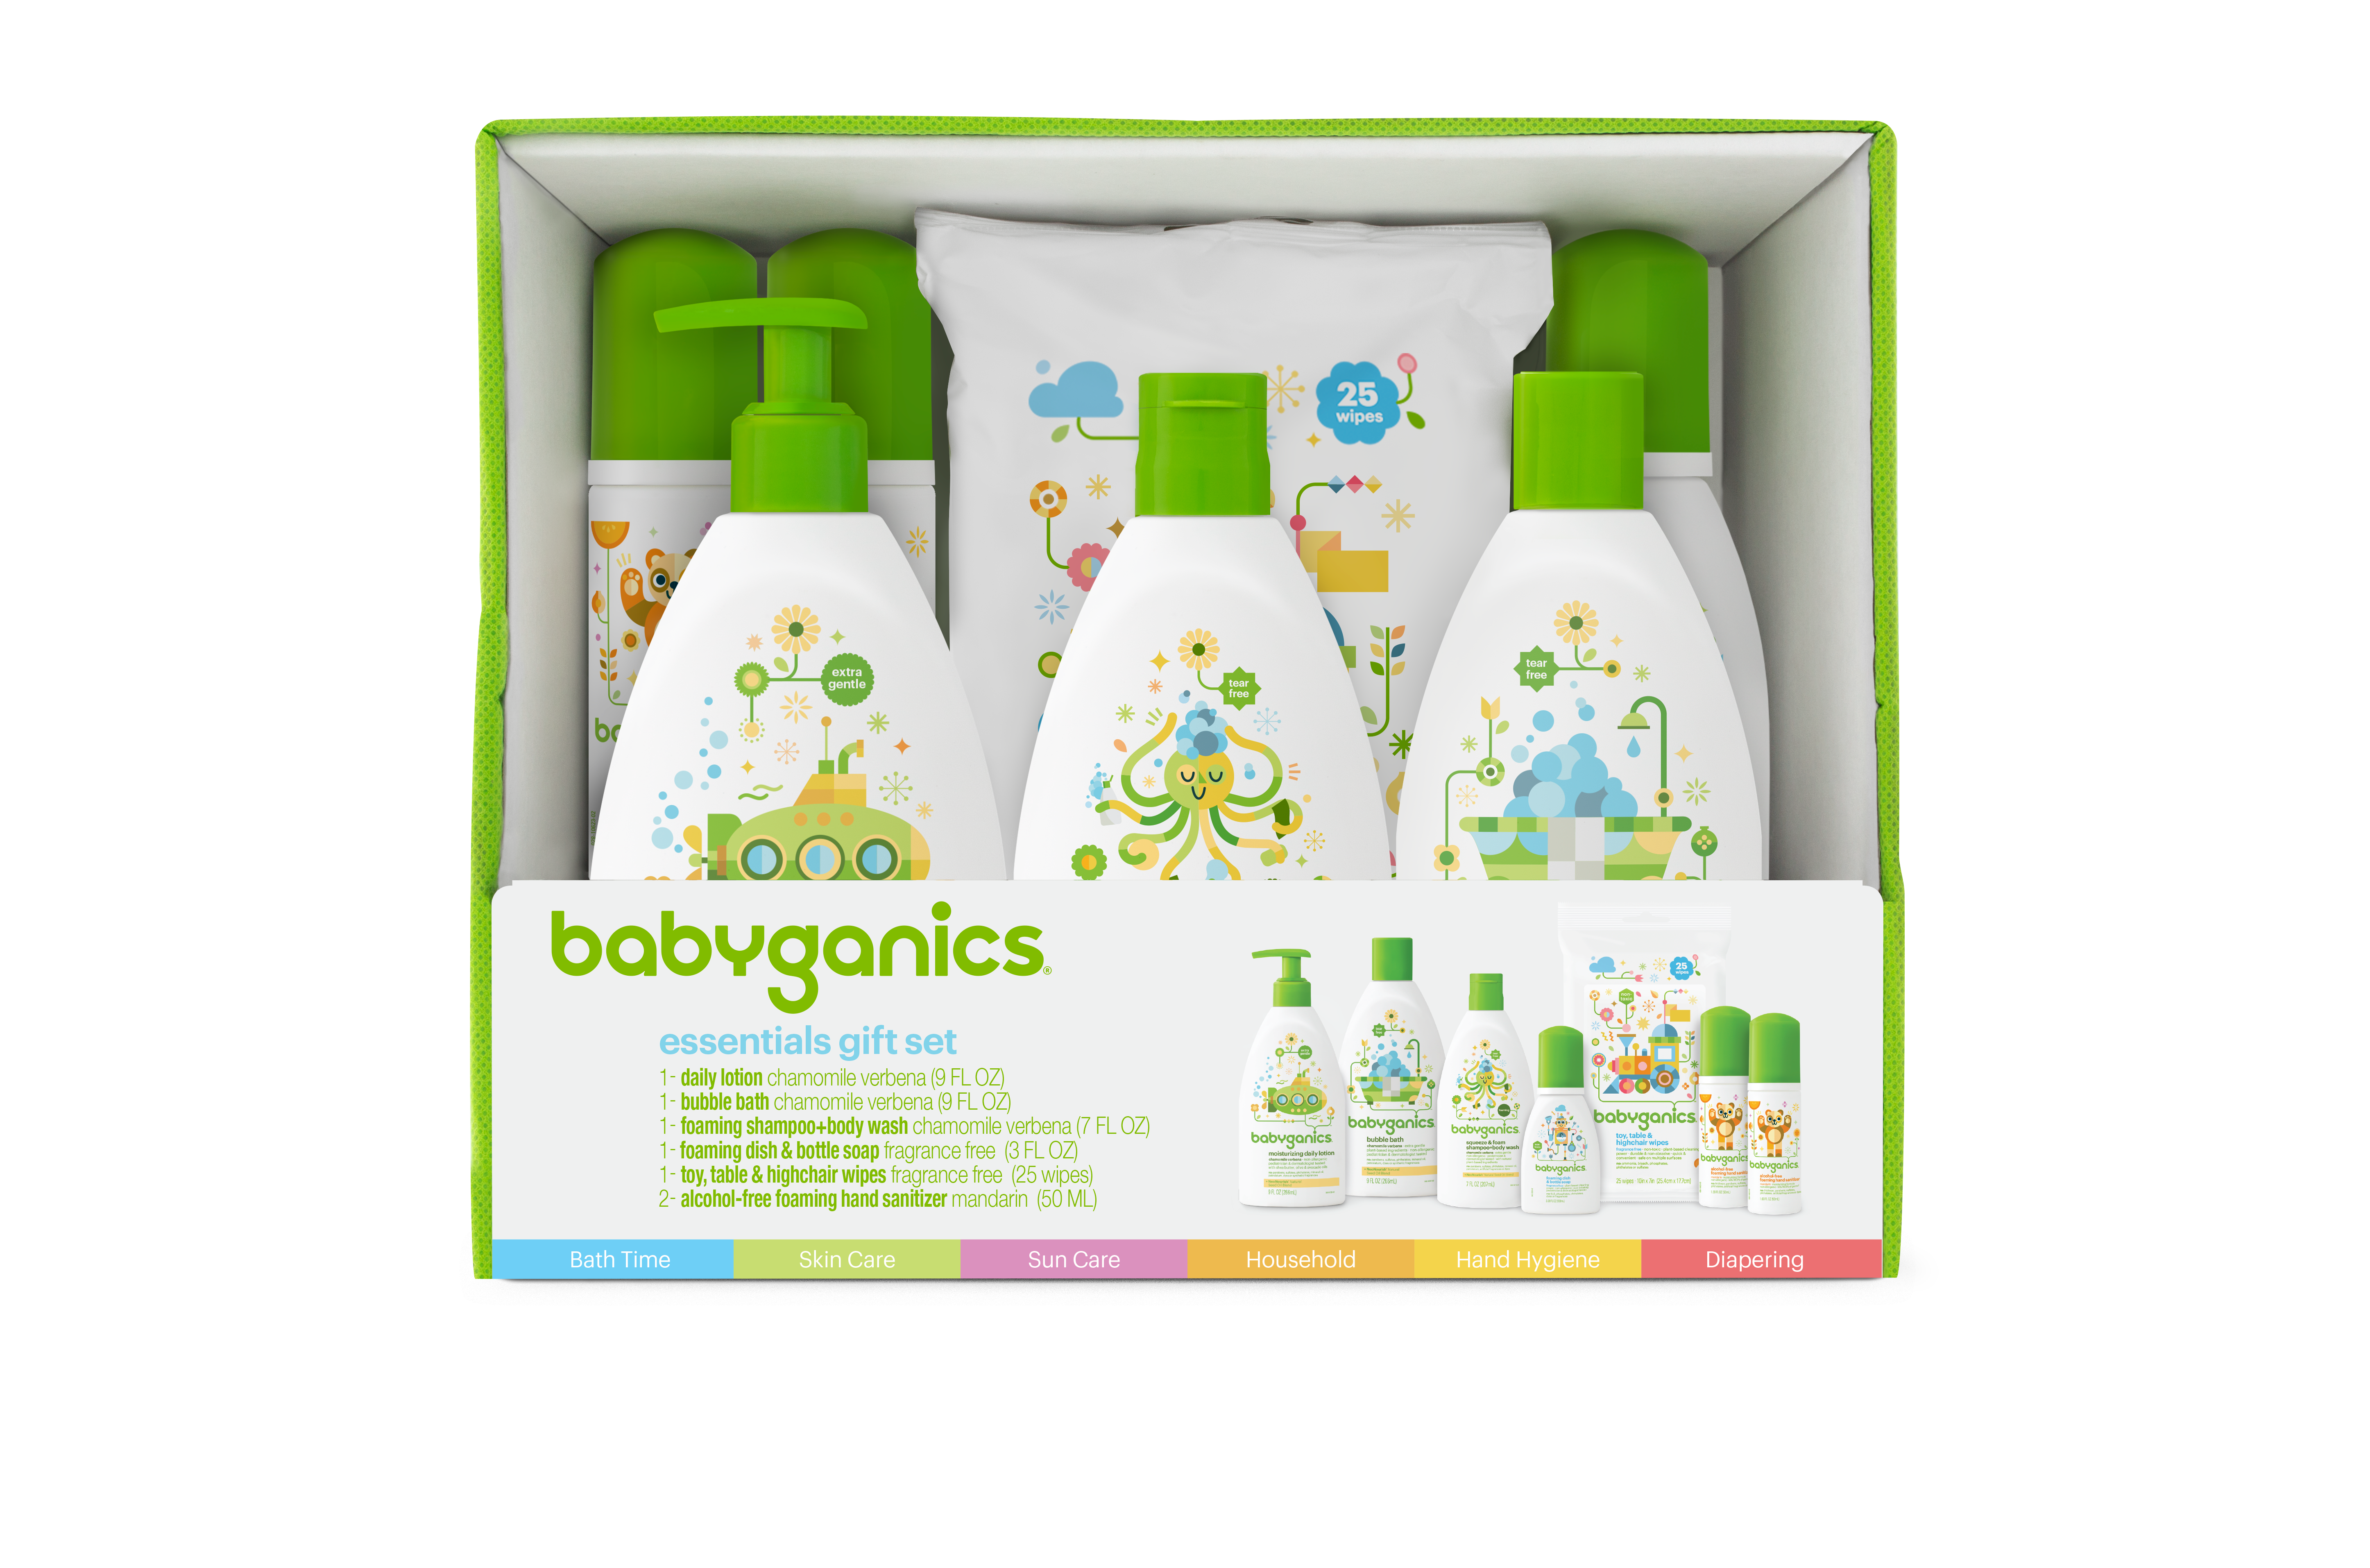 Babyganics essentials gift set. Shampoo clipart baby wash